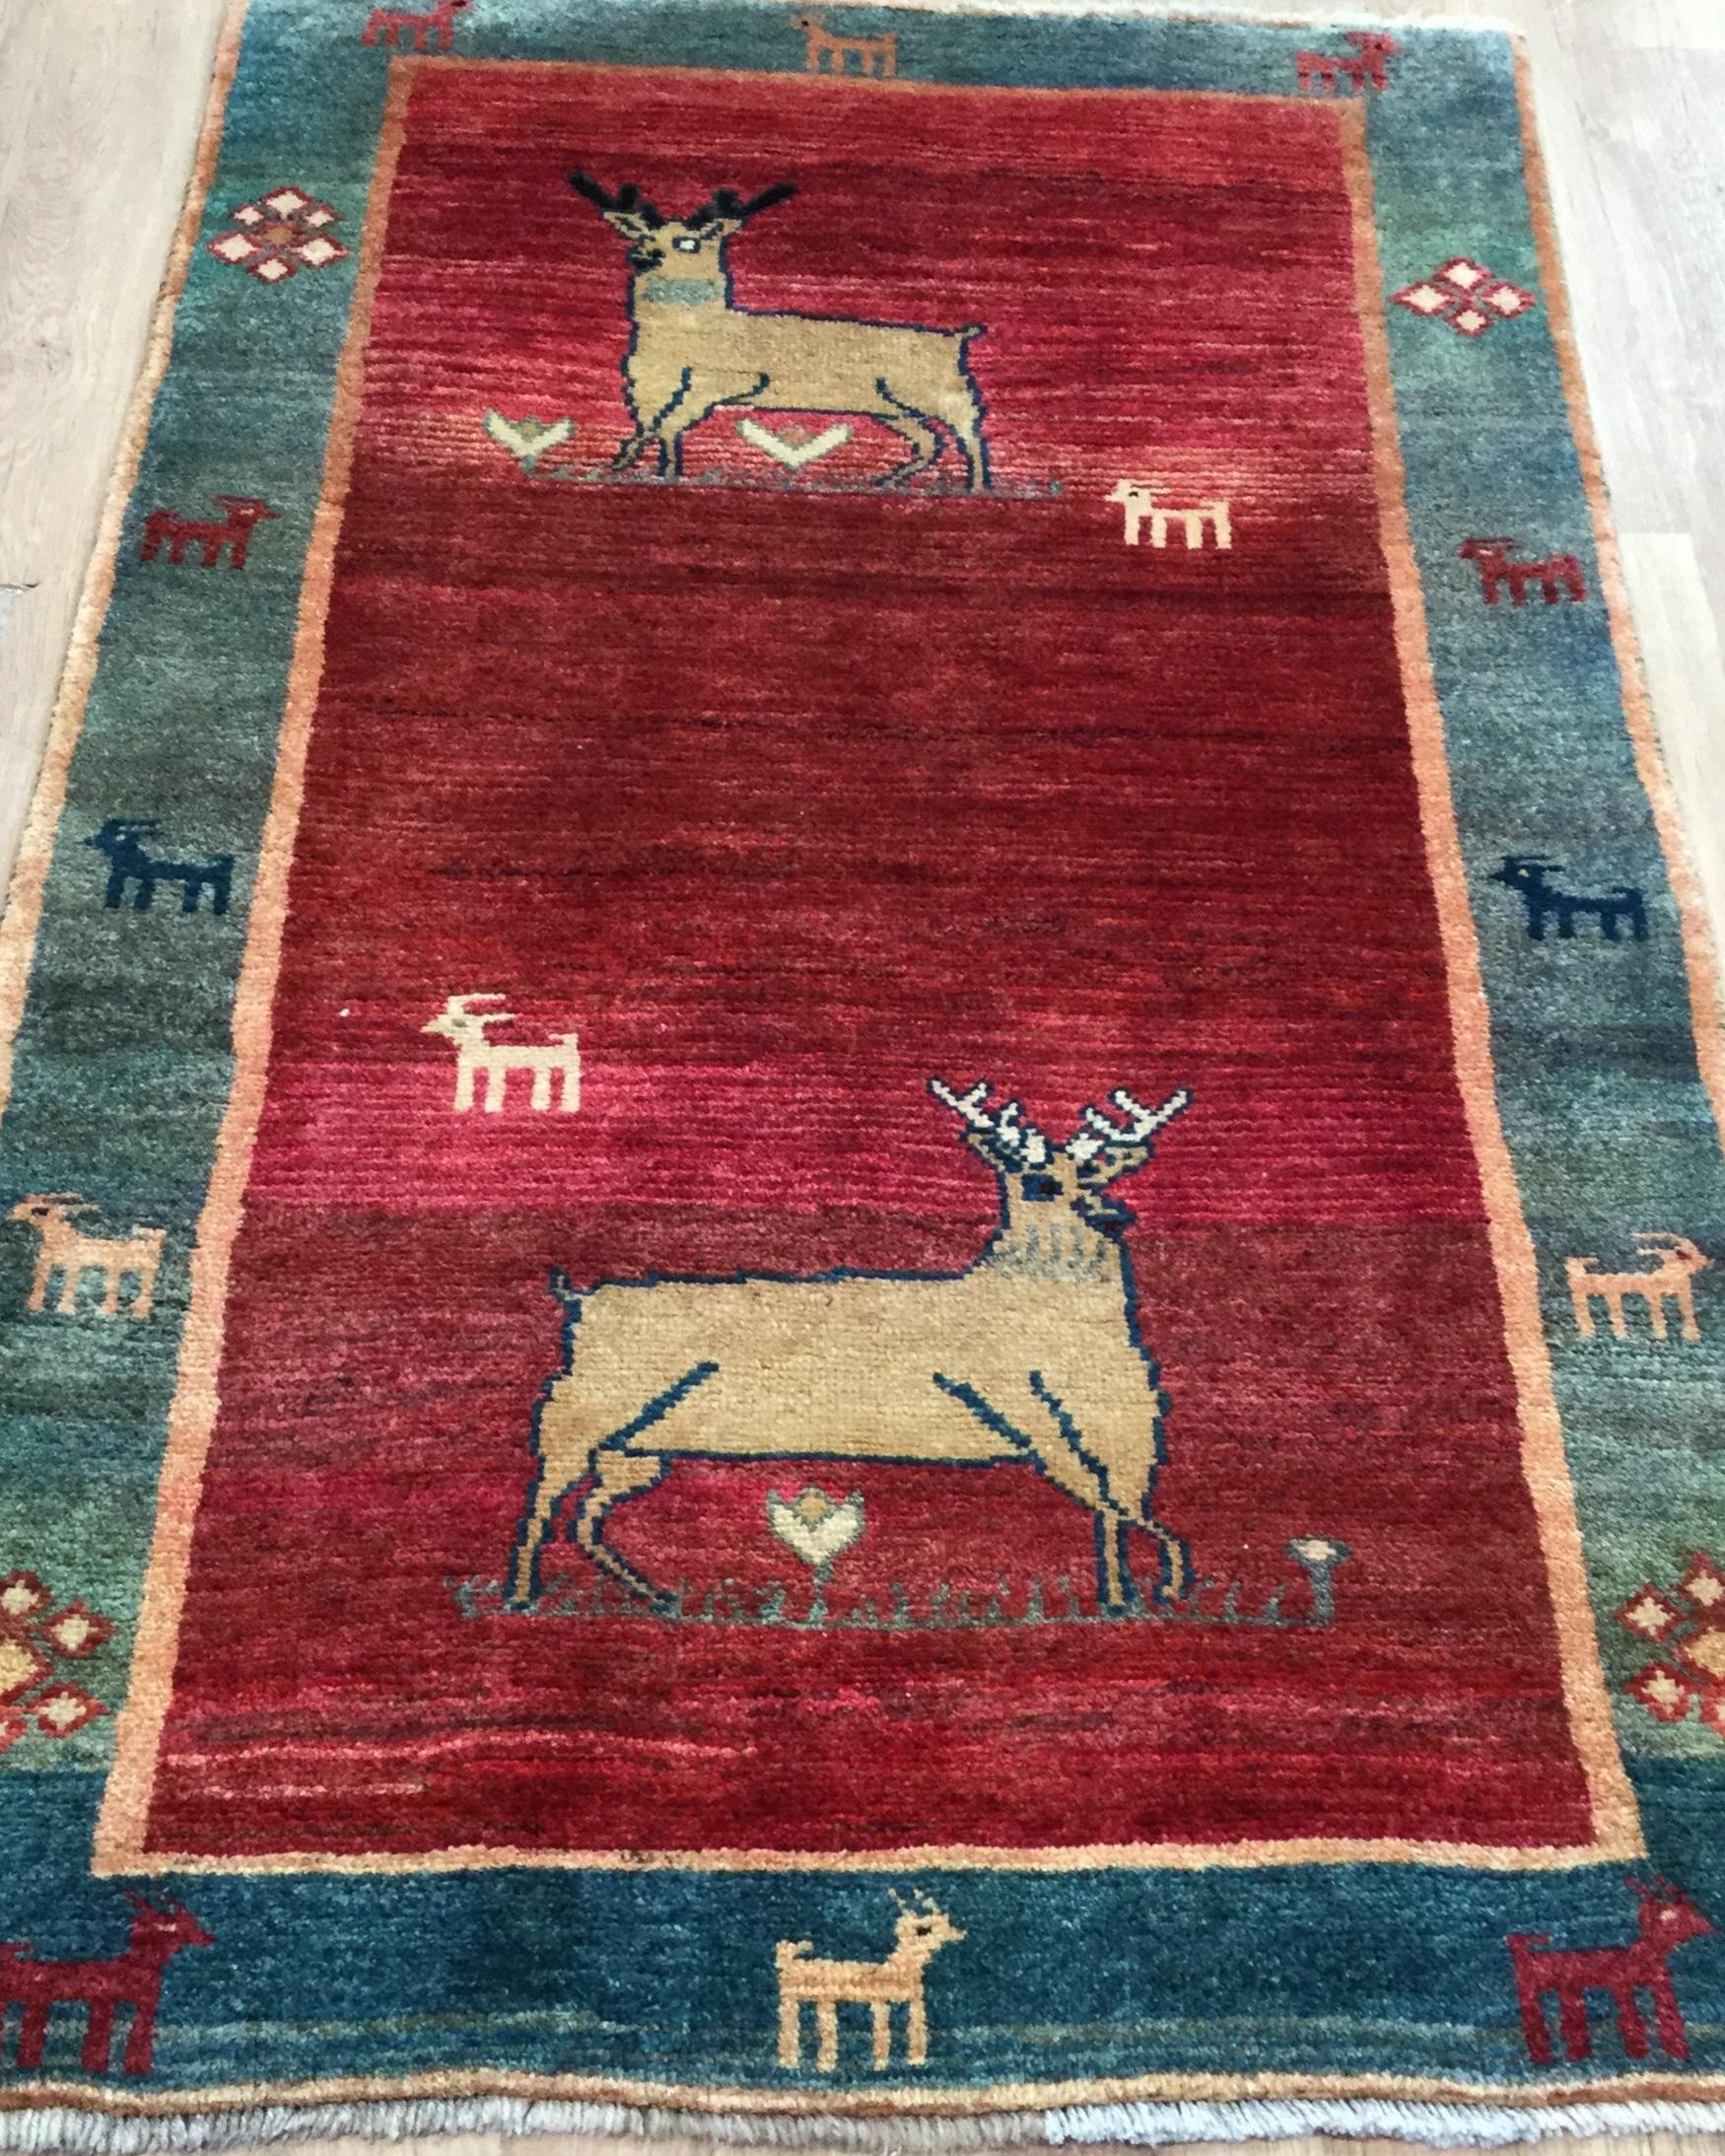 Afghan Gabbeh - Circa 2000'sSize Measurements: 165cm x 100cm